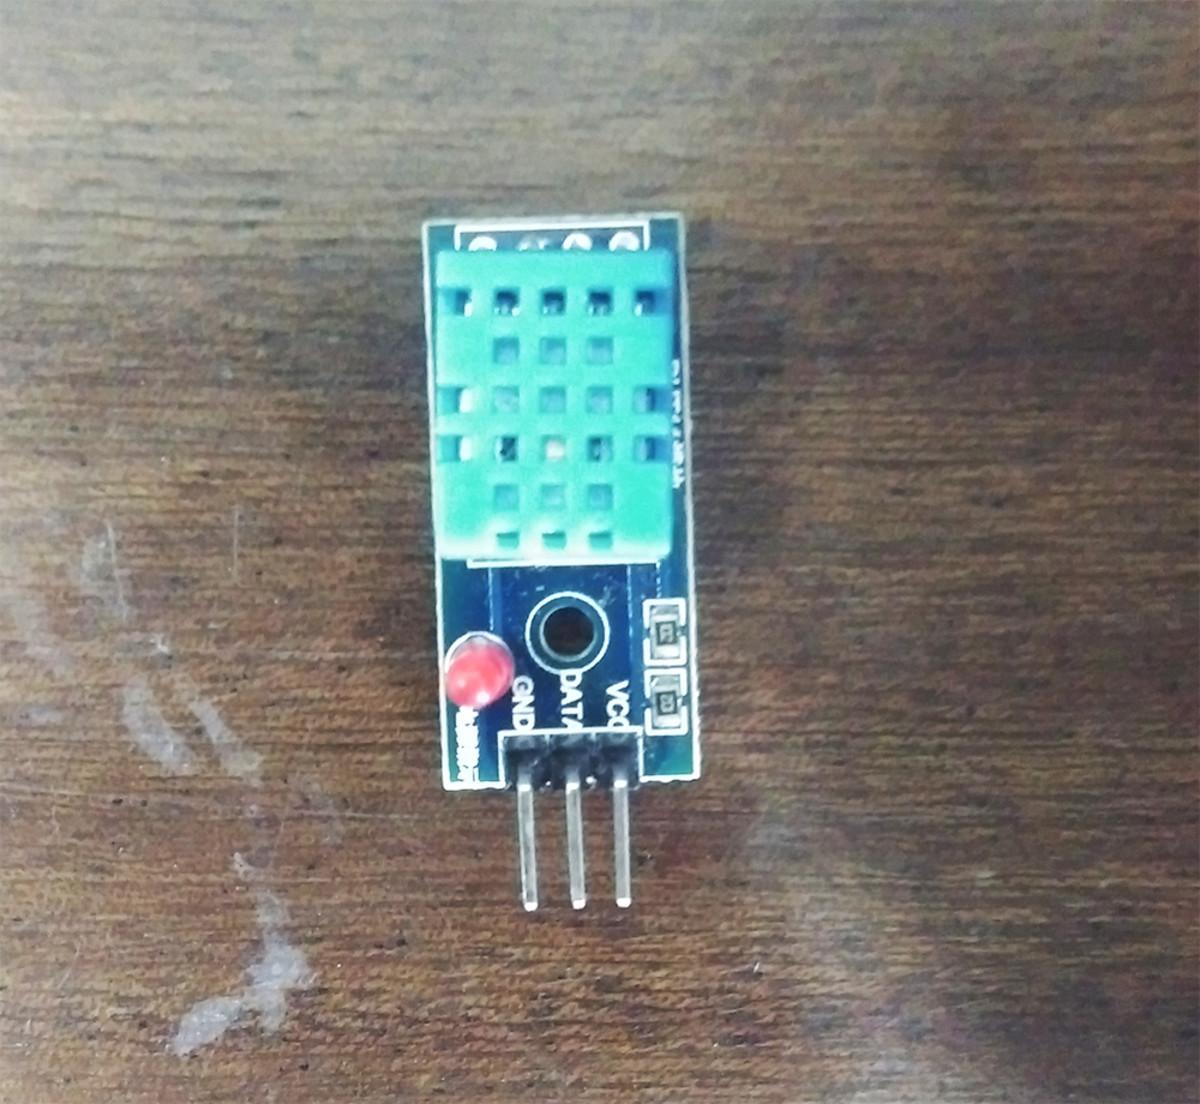 Publish DHT11 Sensor Data To Adafruit IO Platform using ESP8266